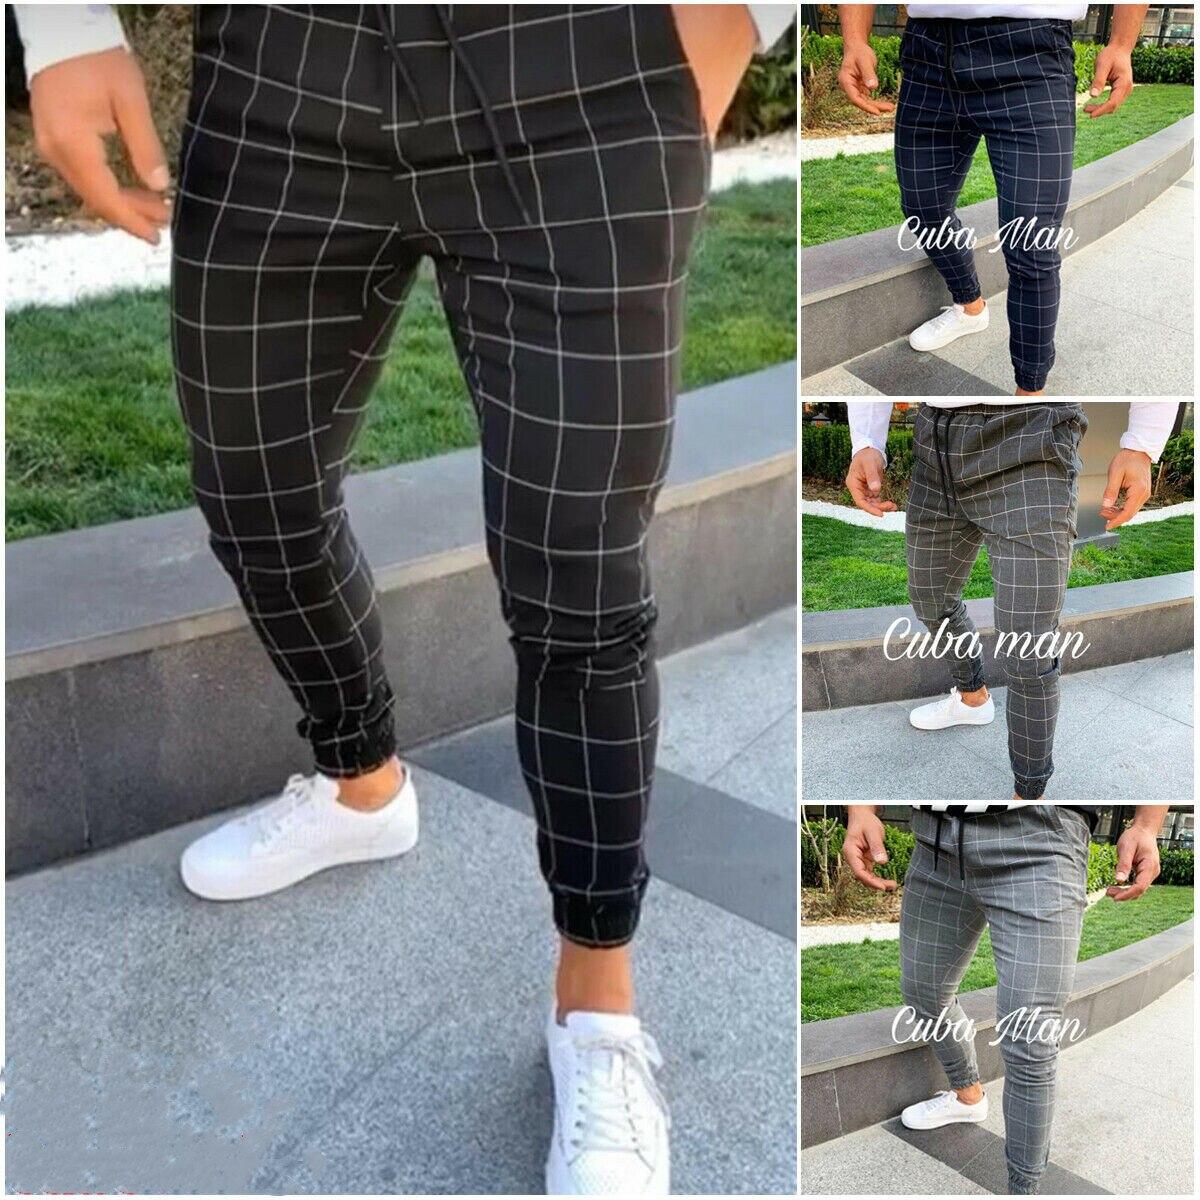 ¡Novedad de 2019! Pantalones de chándal de sarga a cuadros para hombre, pantalones urbanos de Hip Hop Harem, pantalones informales ajustados